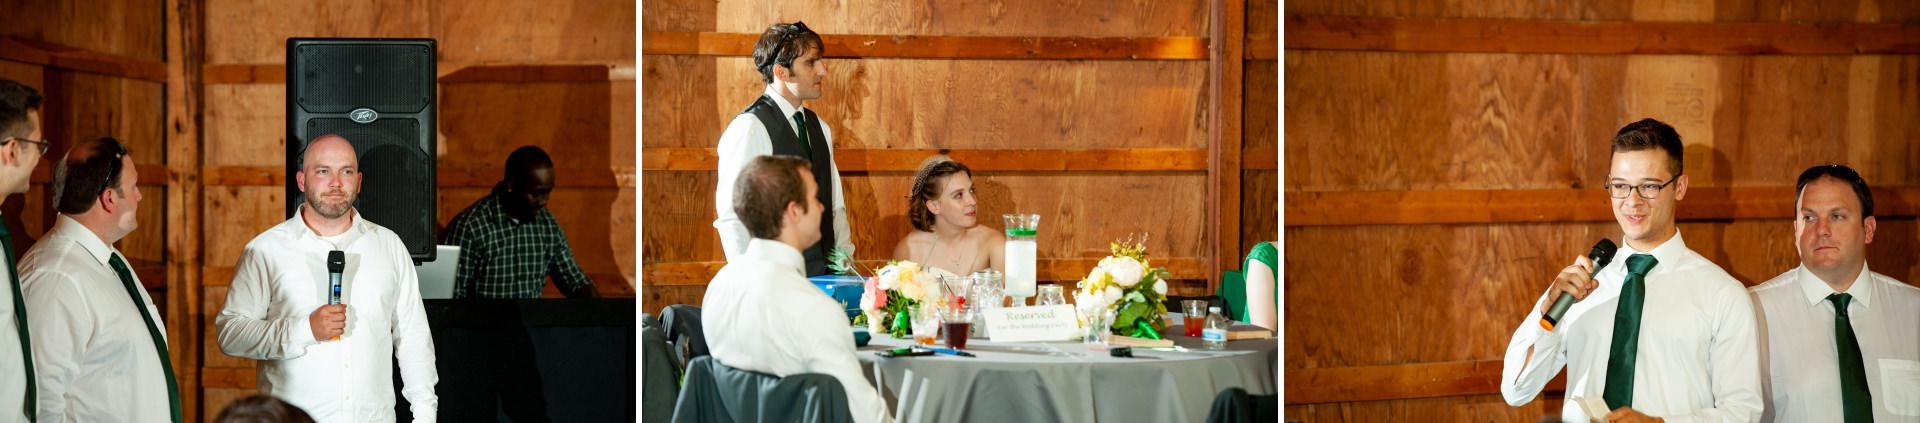 Cleveland Wedding Photos 41.jpg